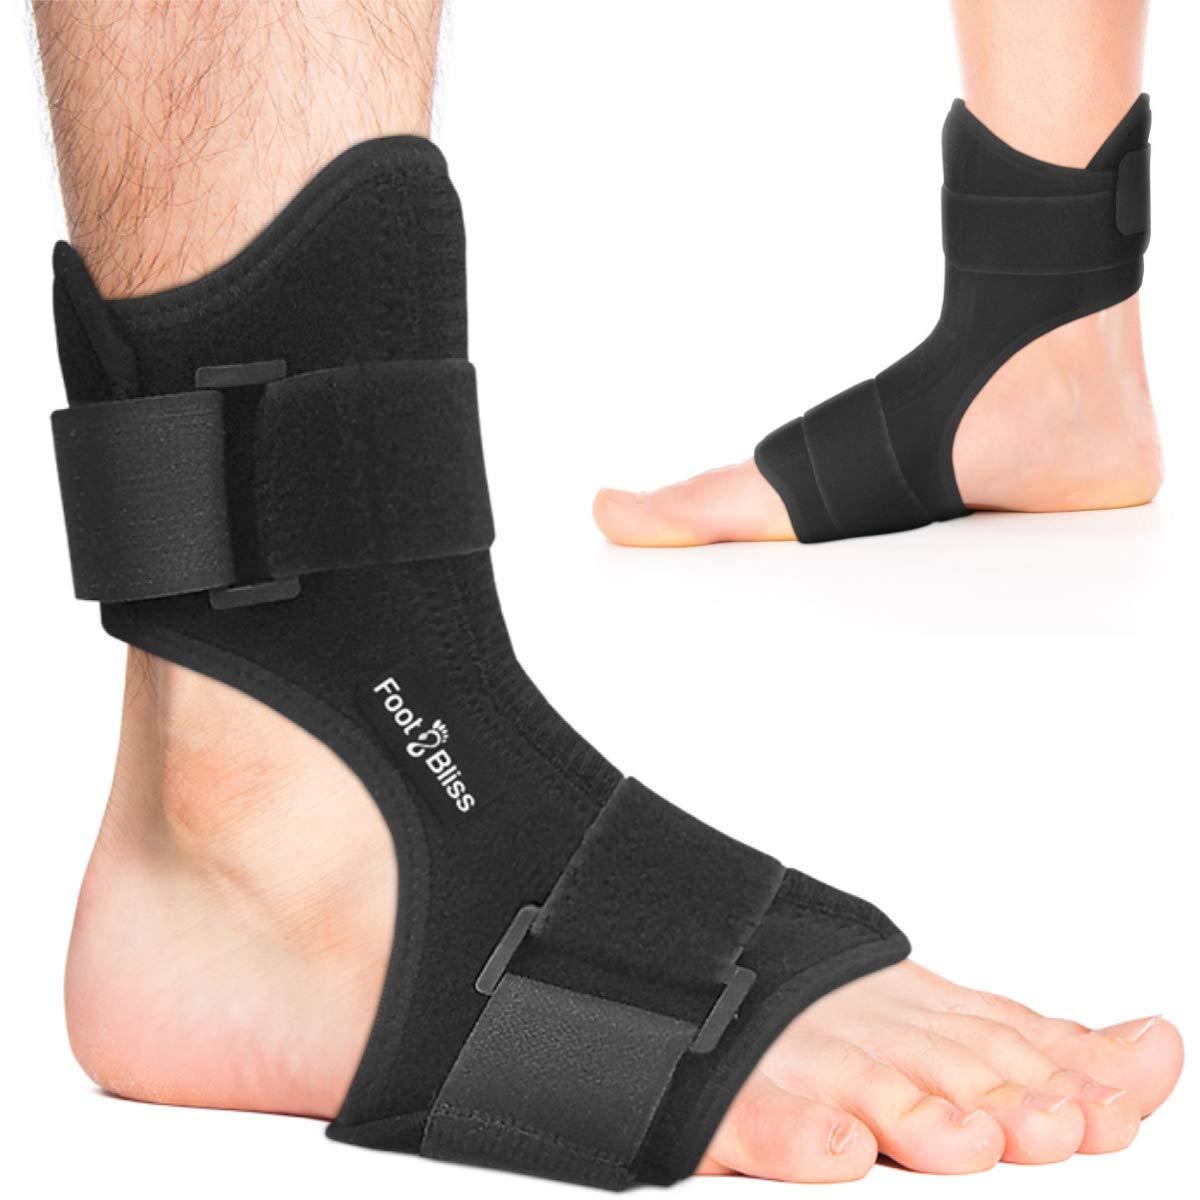 Plantar Fasciitis Night Splint - Drop Foot Support Brace - Dorsal Planter Fasciitis Splints for Right or Left Foot. Support Sleep, Arthritis, Tendonitis, Dorsiflexion, Heel Calf Stretcher, Men & Women